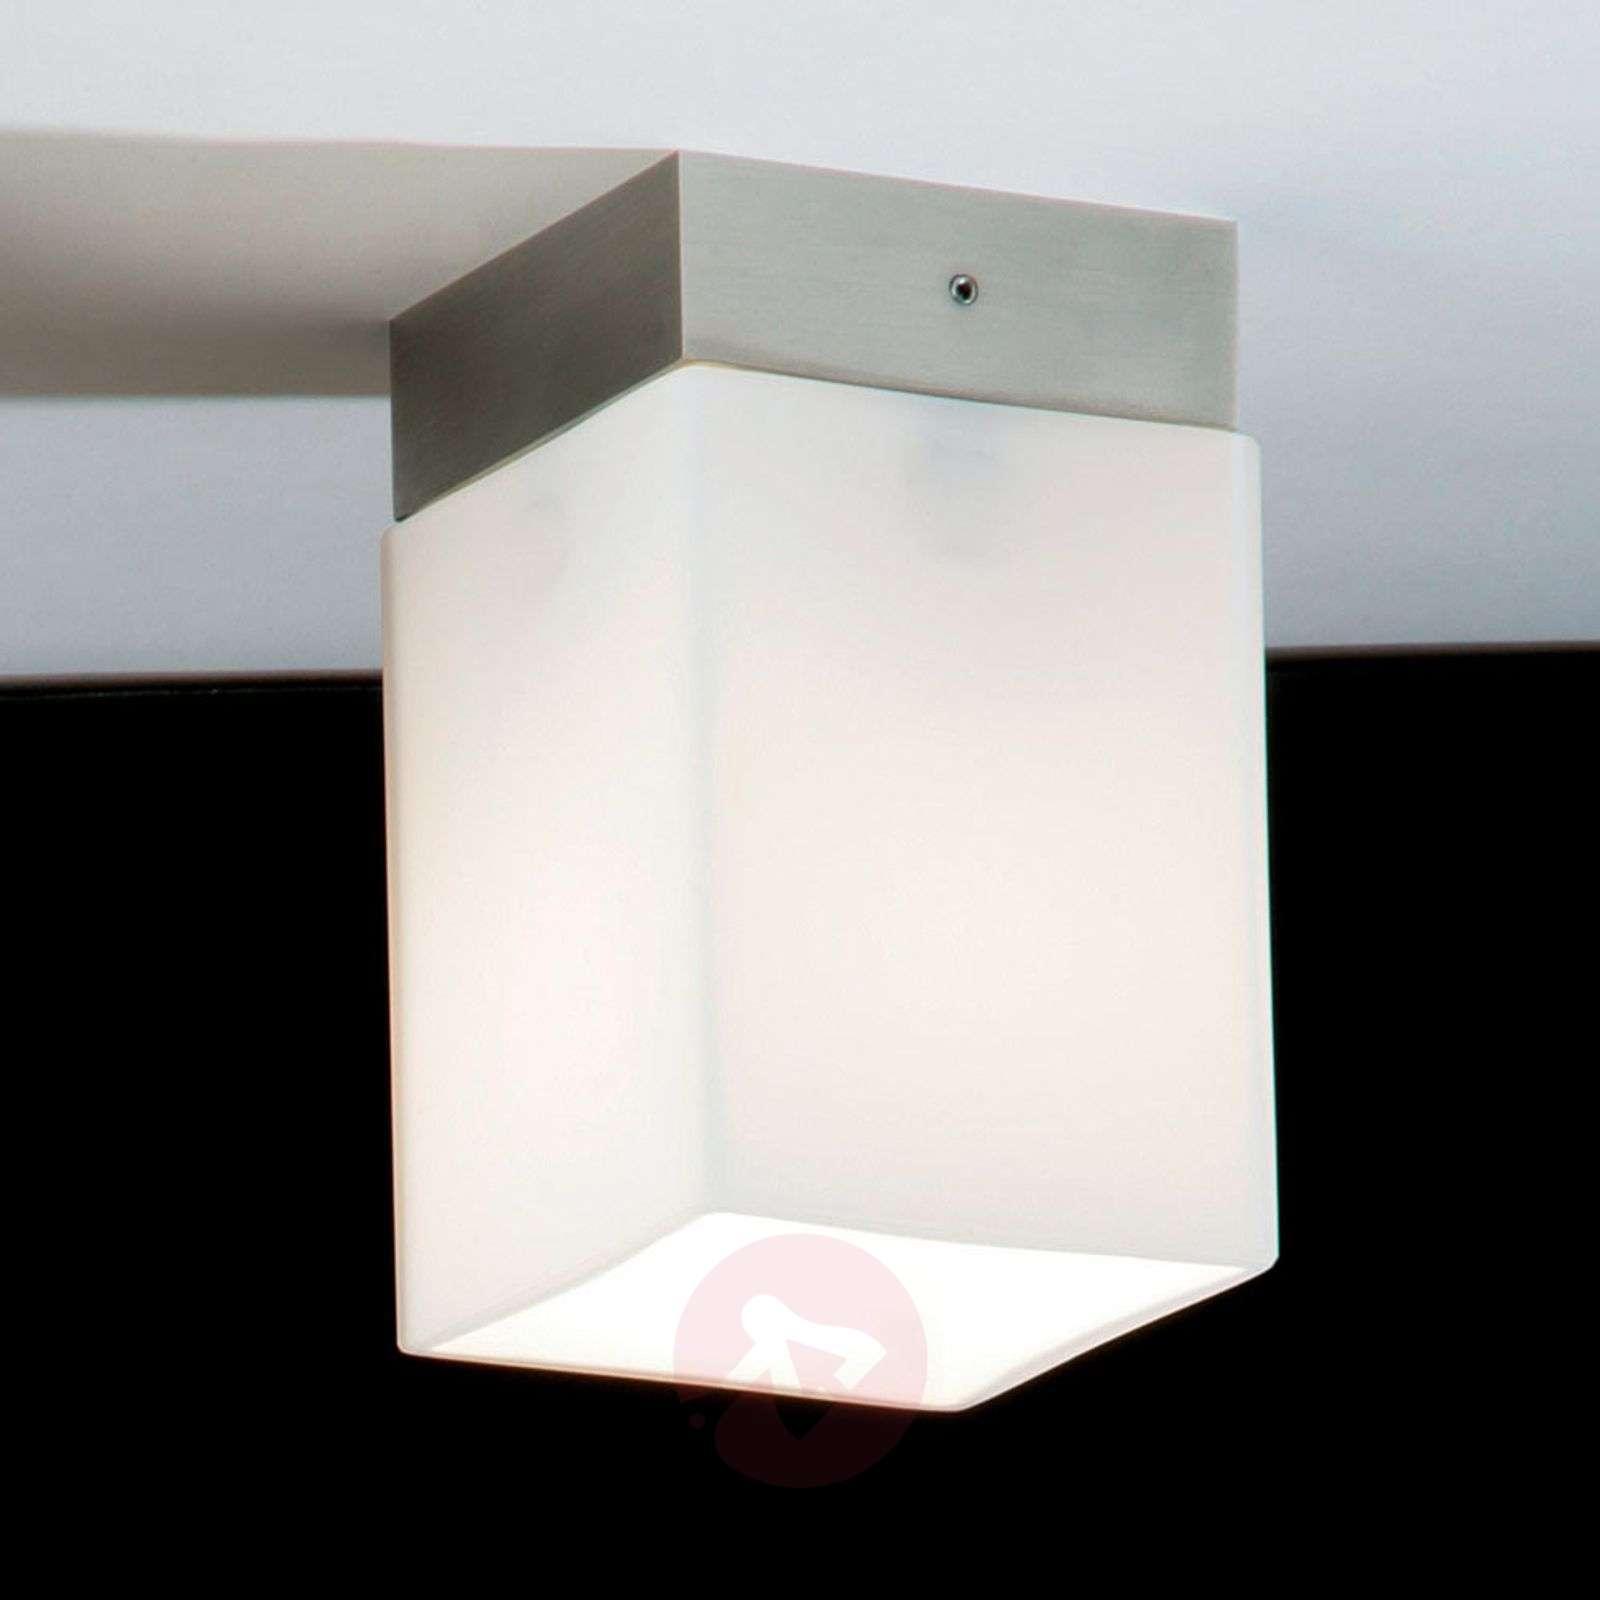 Short ceiling light QUADRO BOX SHORT-9020030X-01